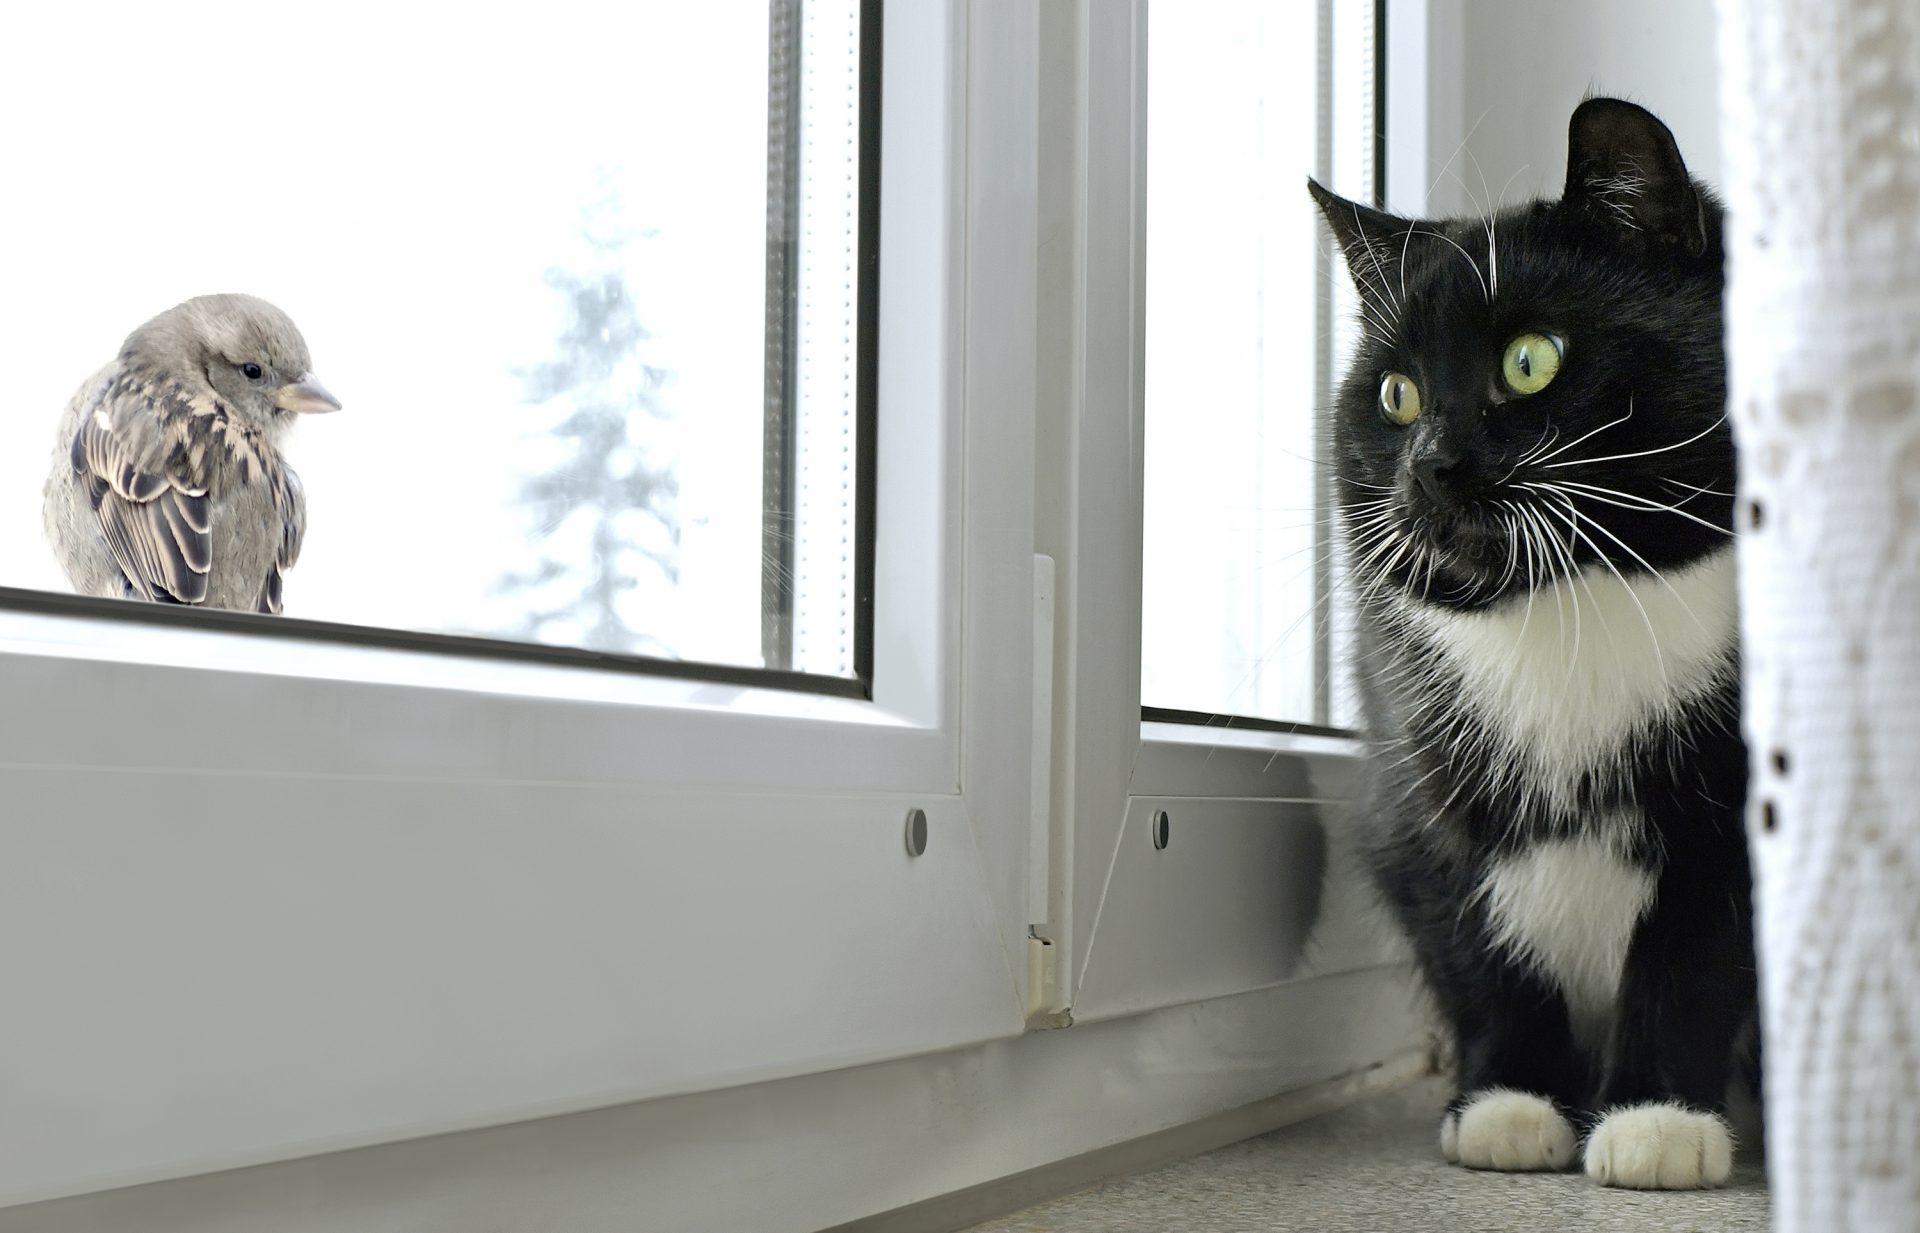 Cute Kitties Hd Wallpapers Threats To Birds Celebrate Urban Birds